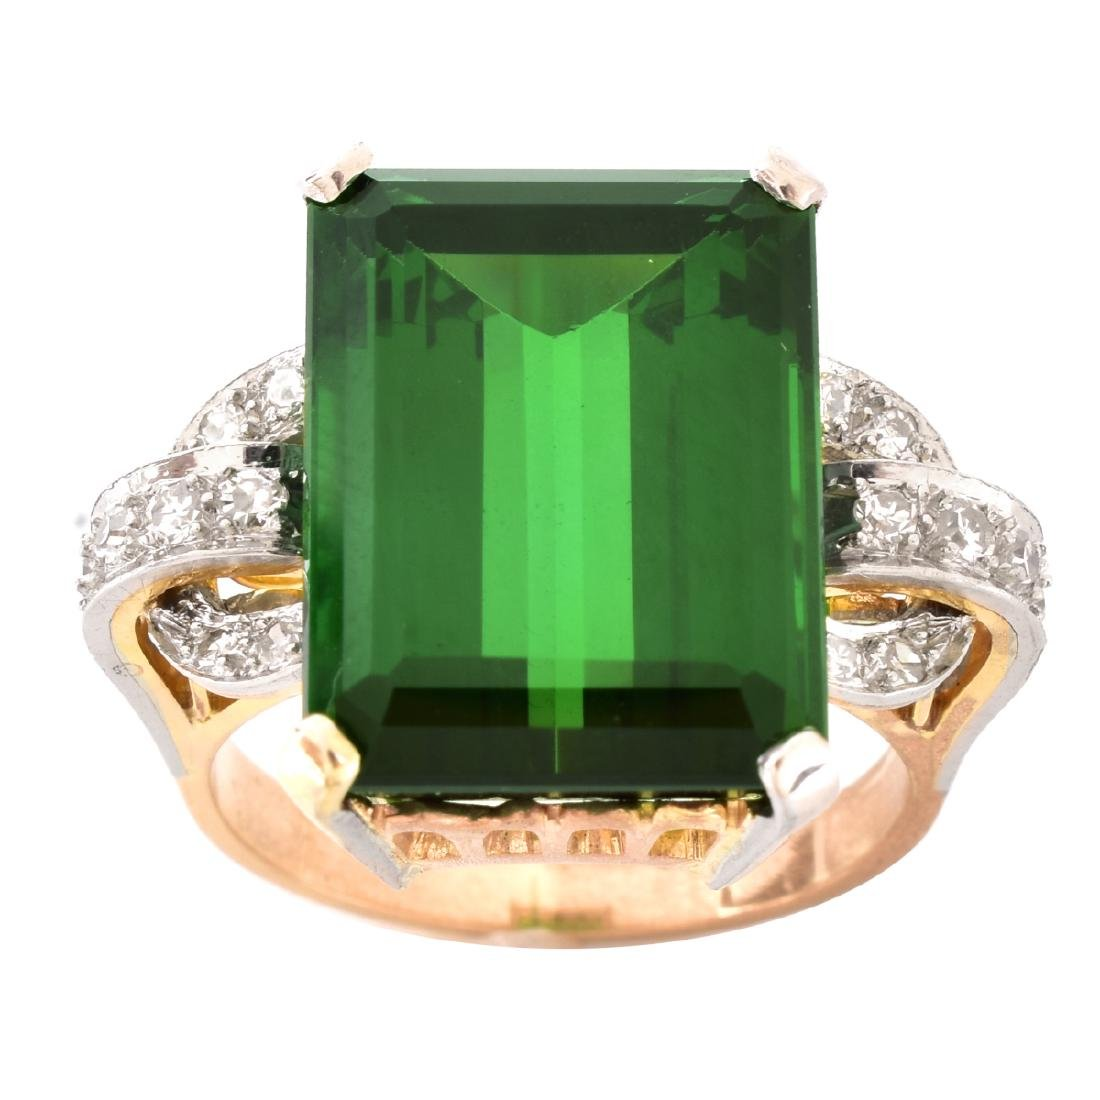 French Tourmaline, Diamond and 18K Gold Ring - 2